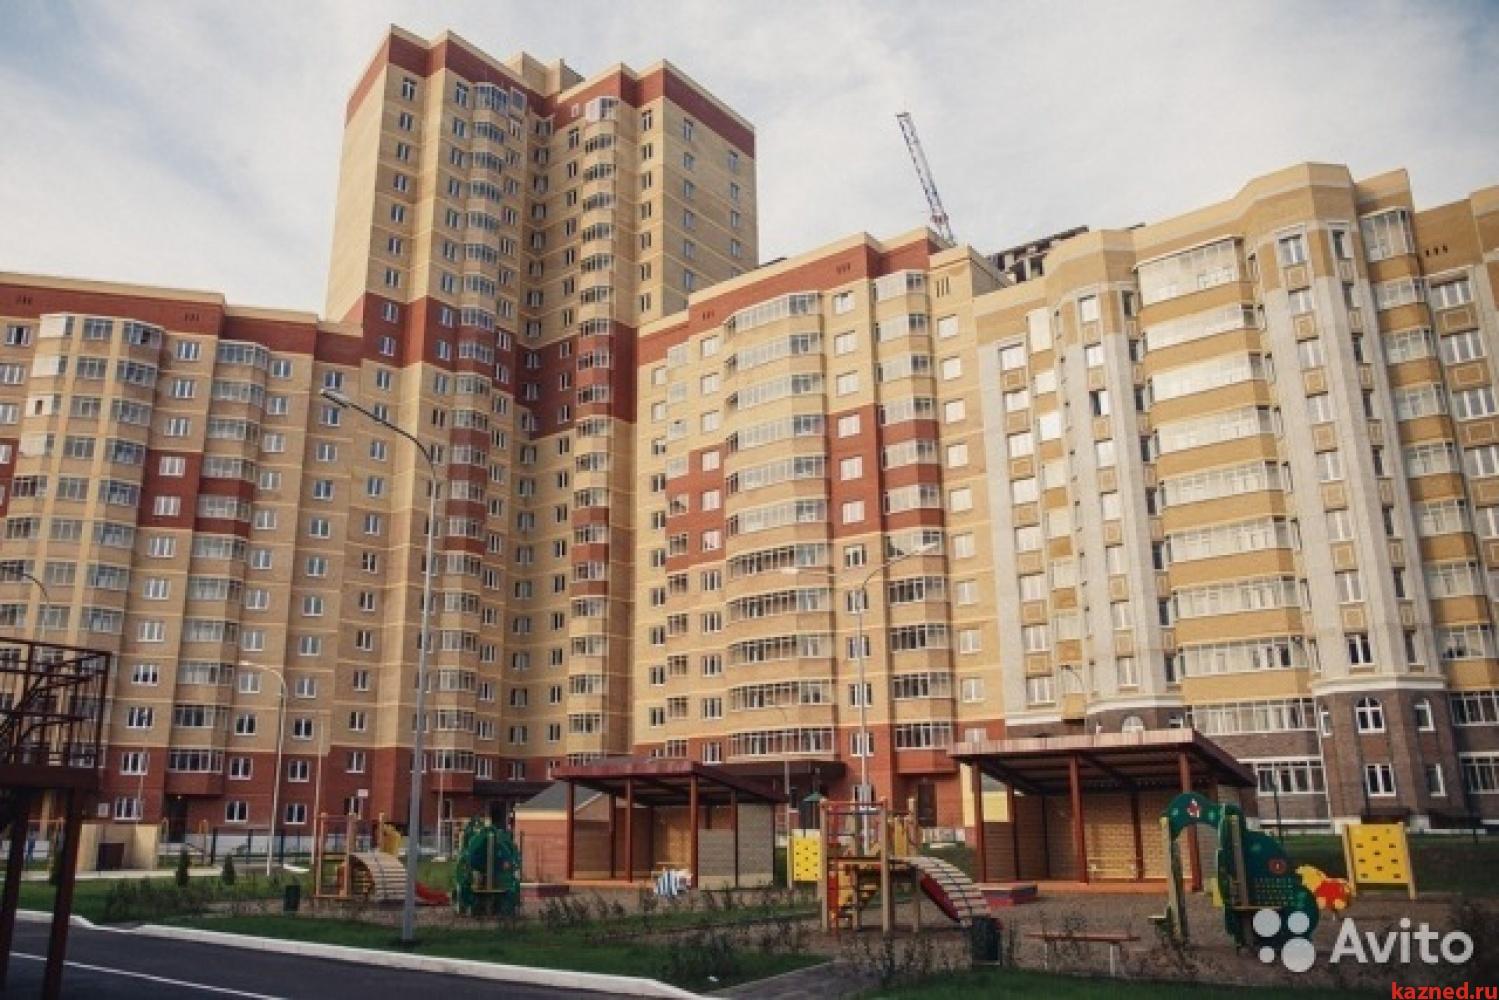 Продажа 3-к квартиры Баки Урманче, 7, 82 м2  (миниатюра №7)